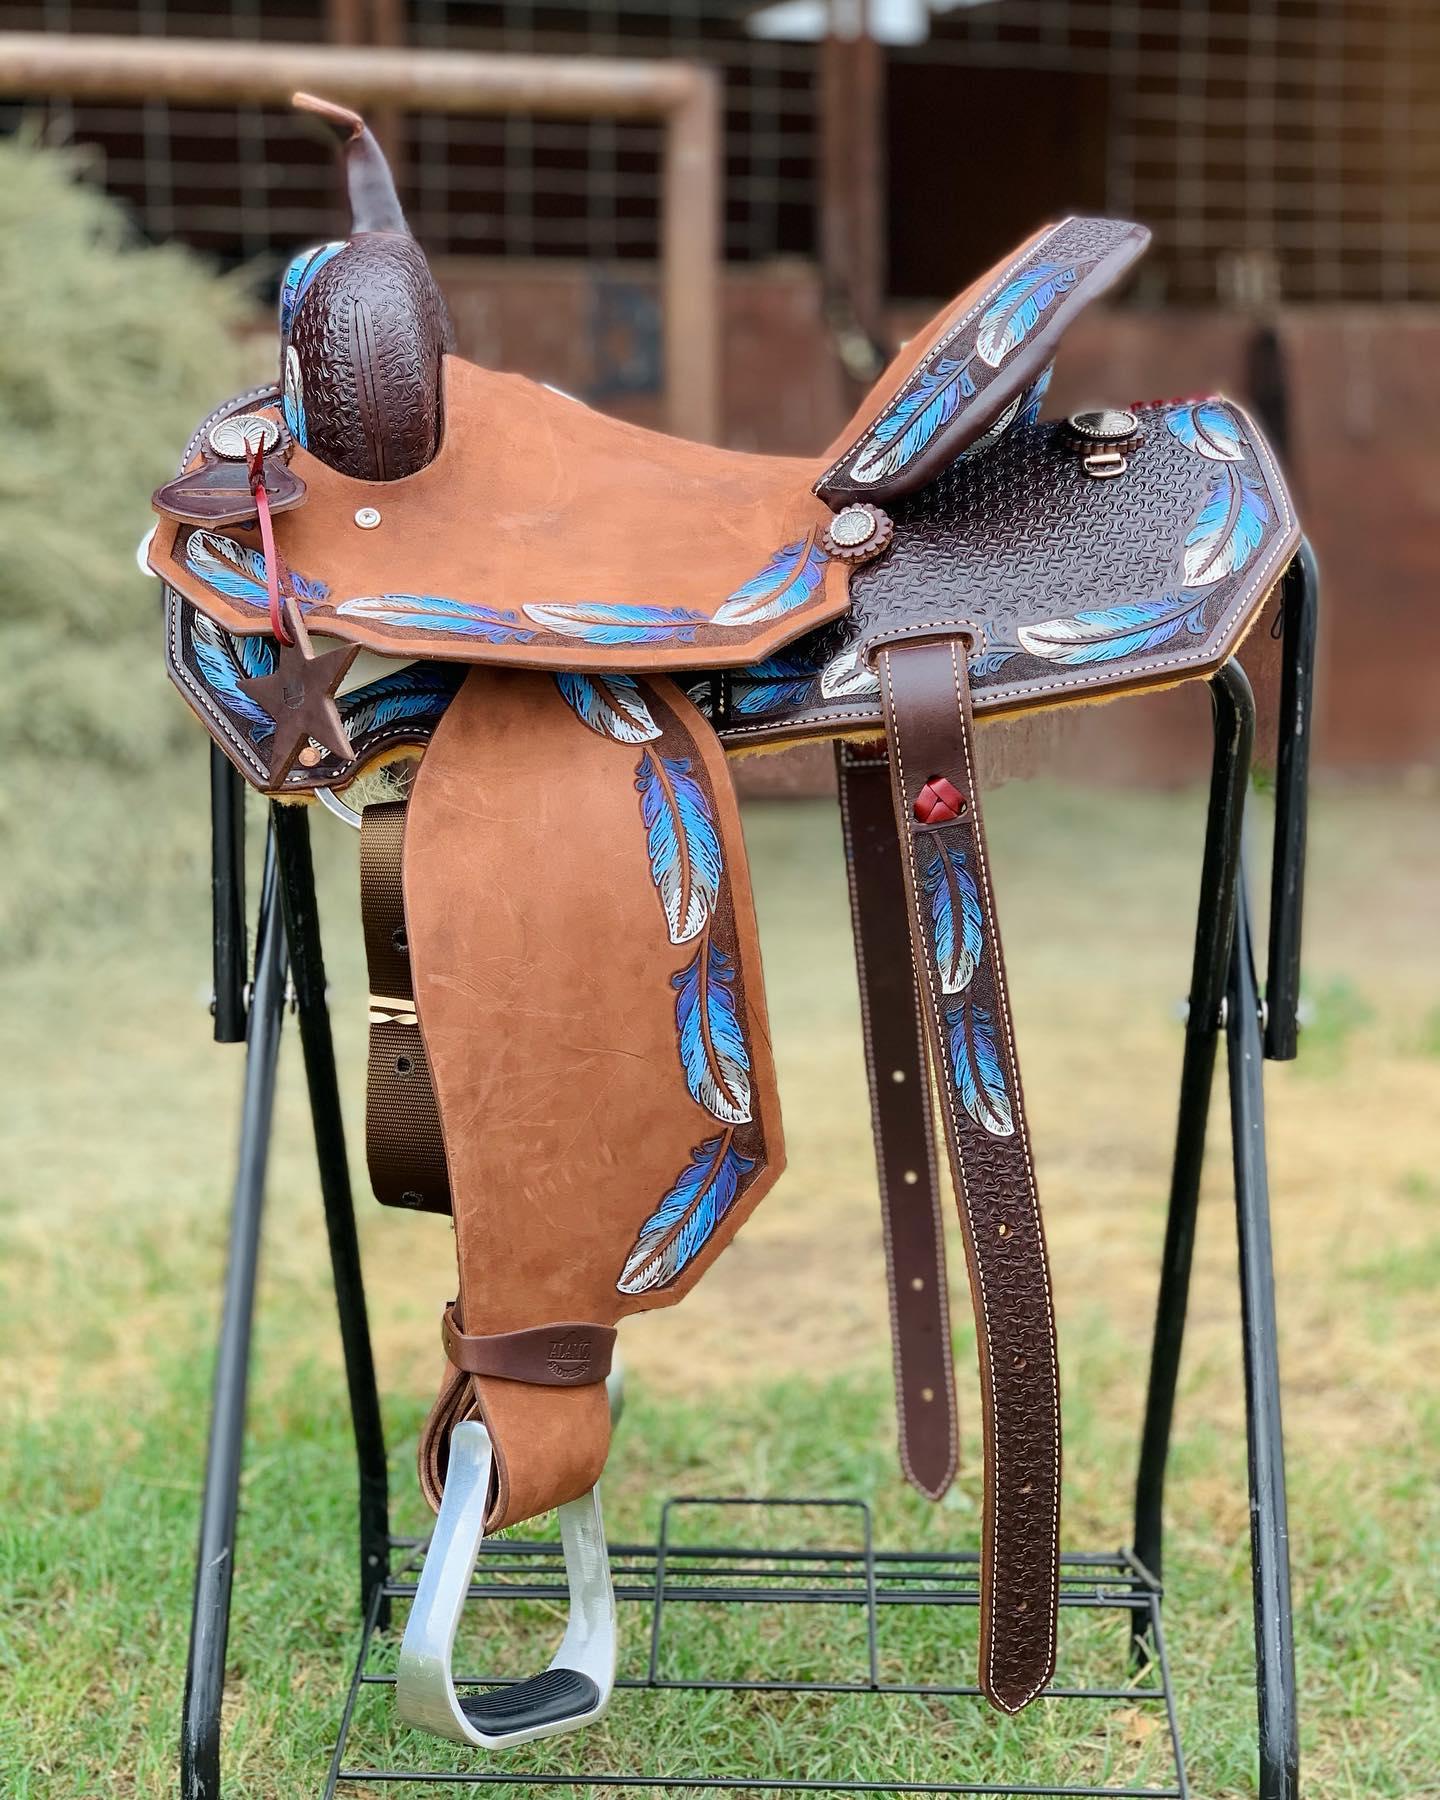 <b>14.5in</b><p>Feather barrel saddle</p>